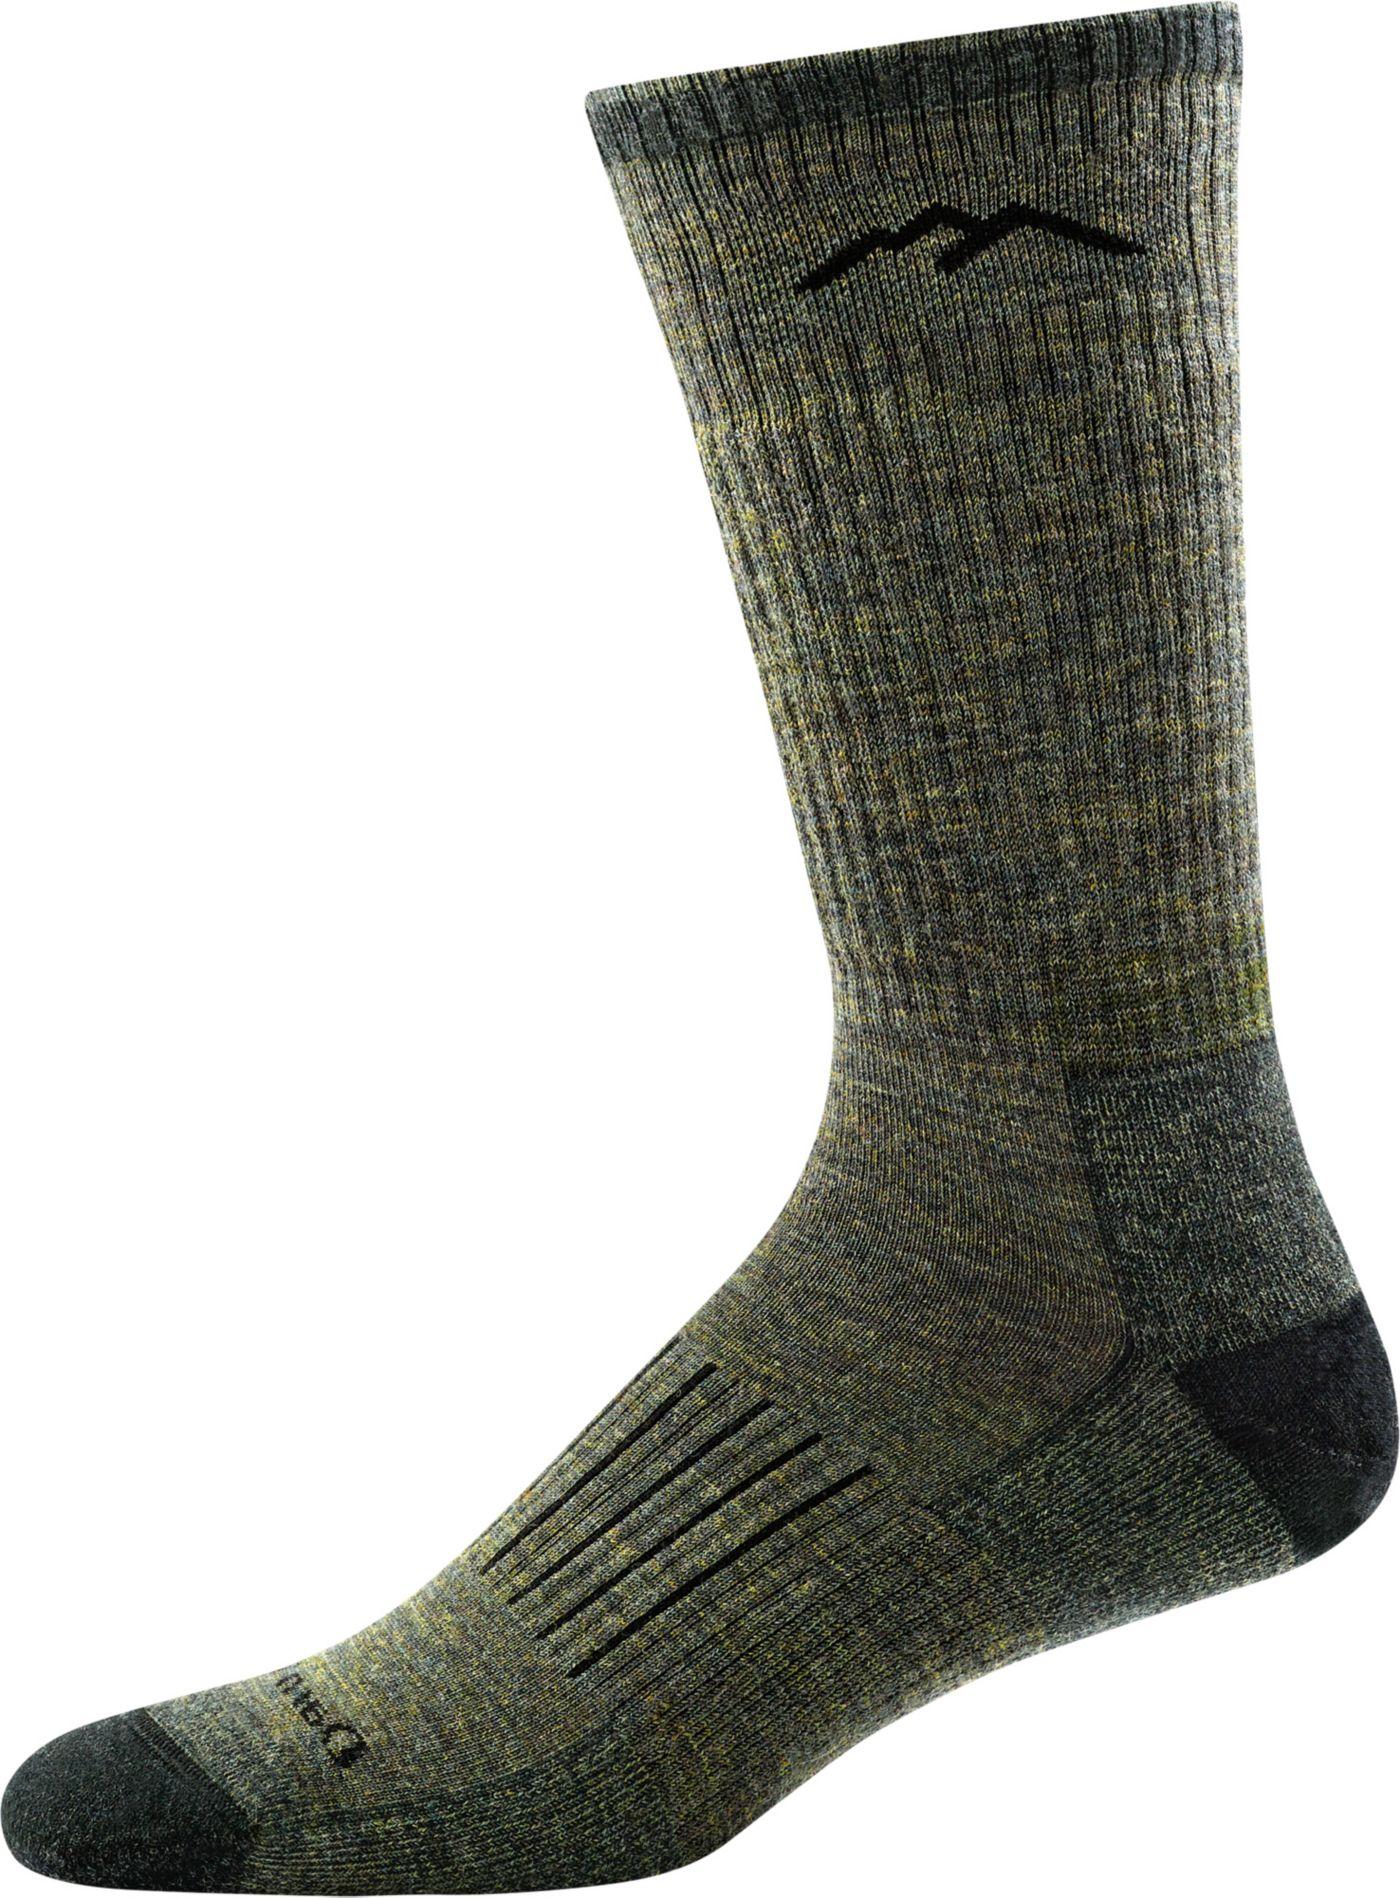 Darn Tough Men's Hunter Boot Cushion Crew Socks